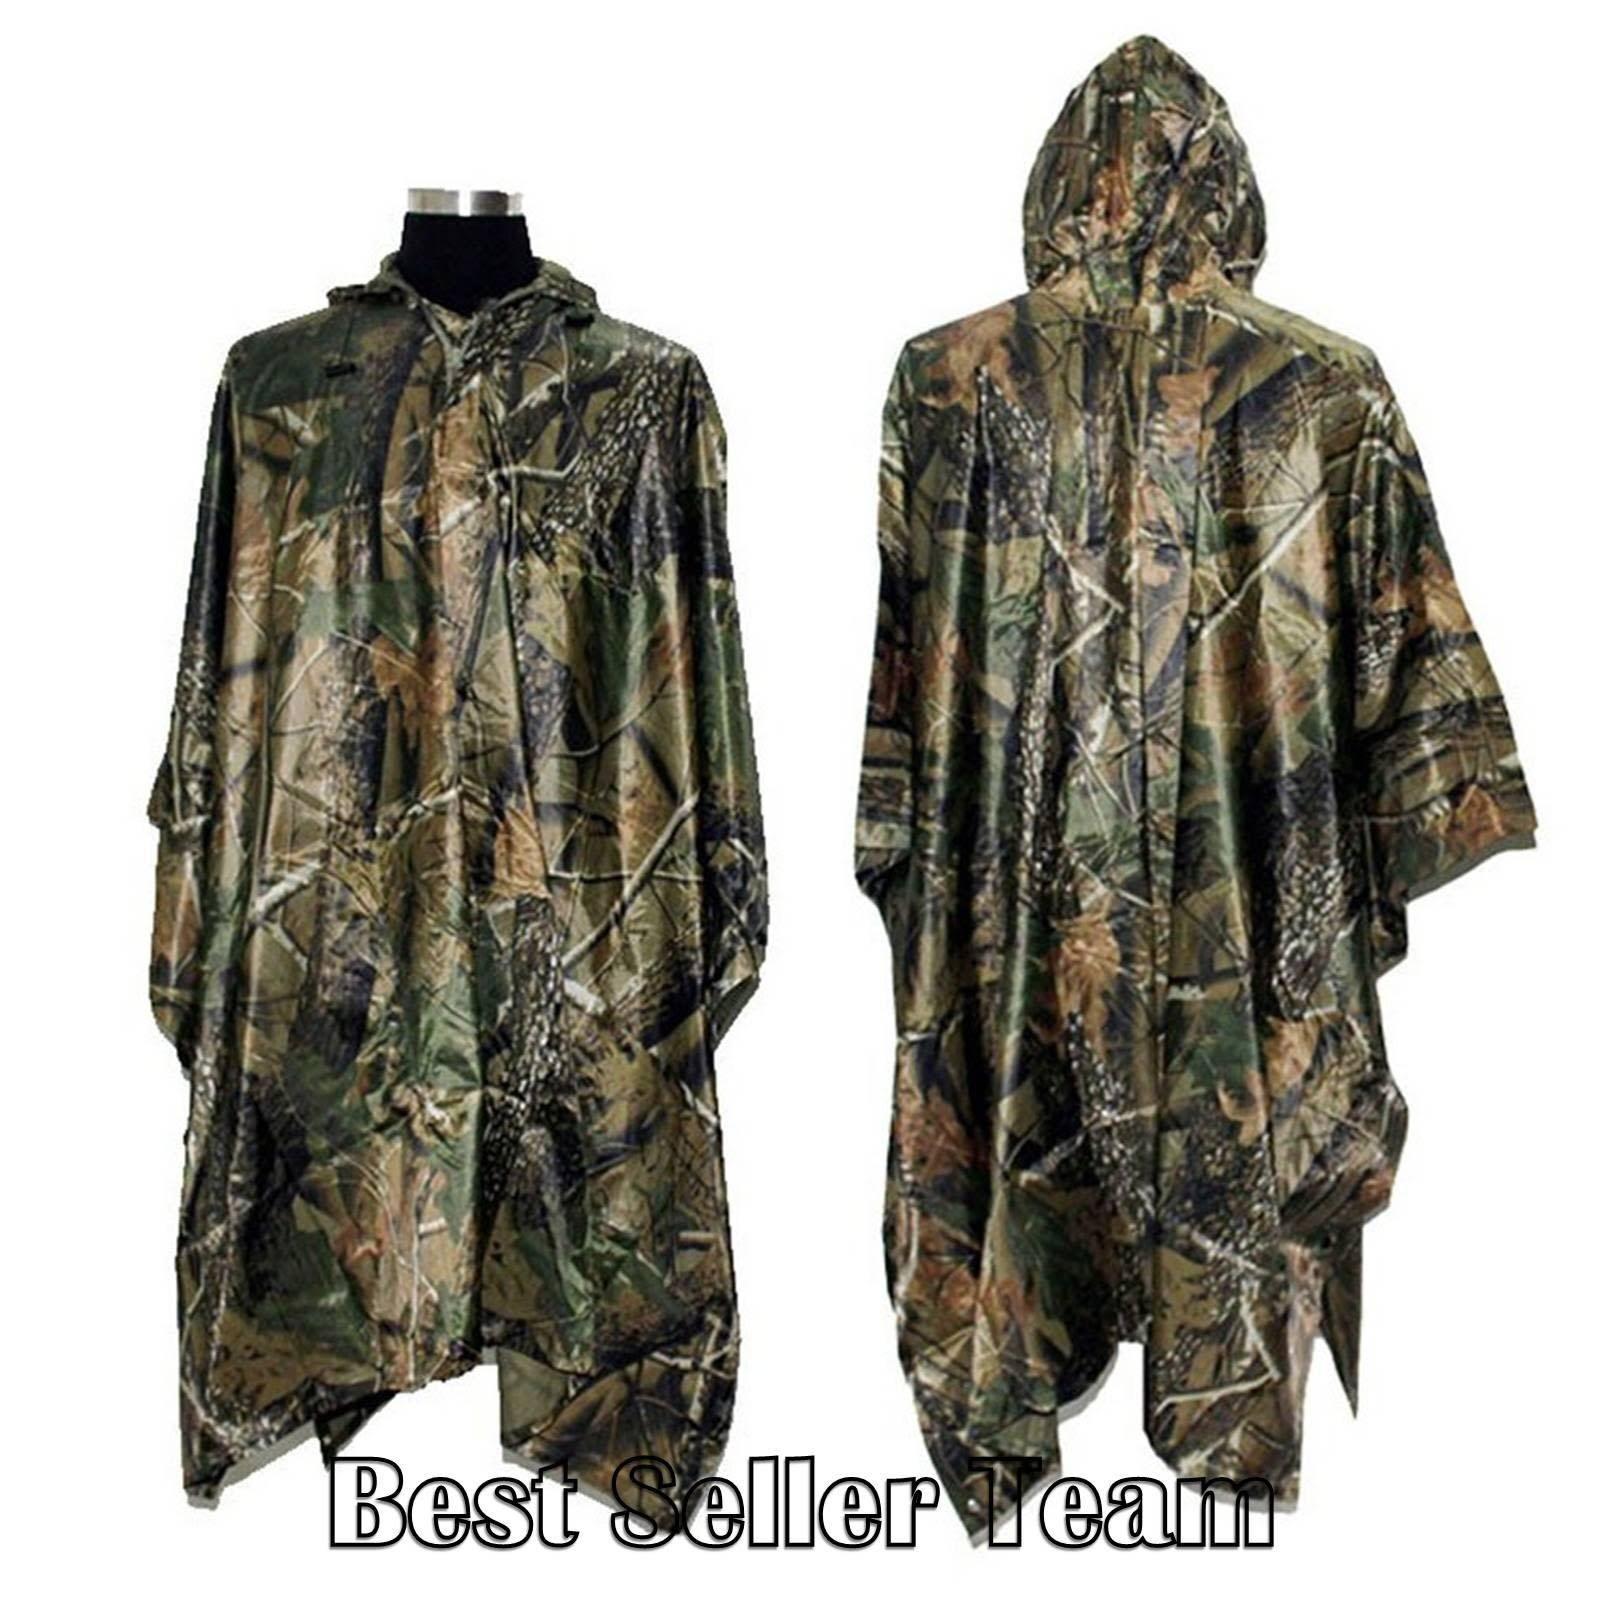 Rain Poncho Military Camouflage Waterproof Sheet Sleeping Bag Camping Hunting